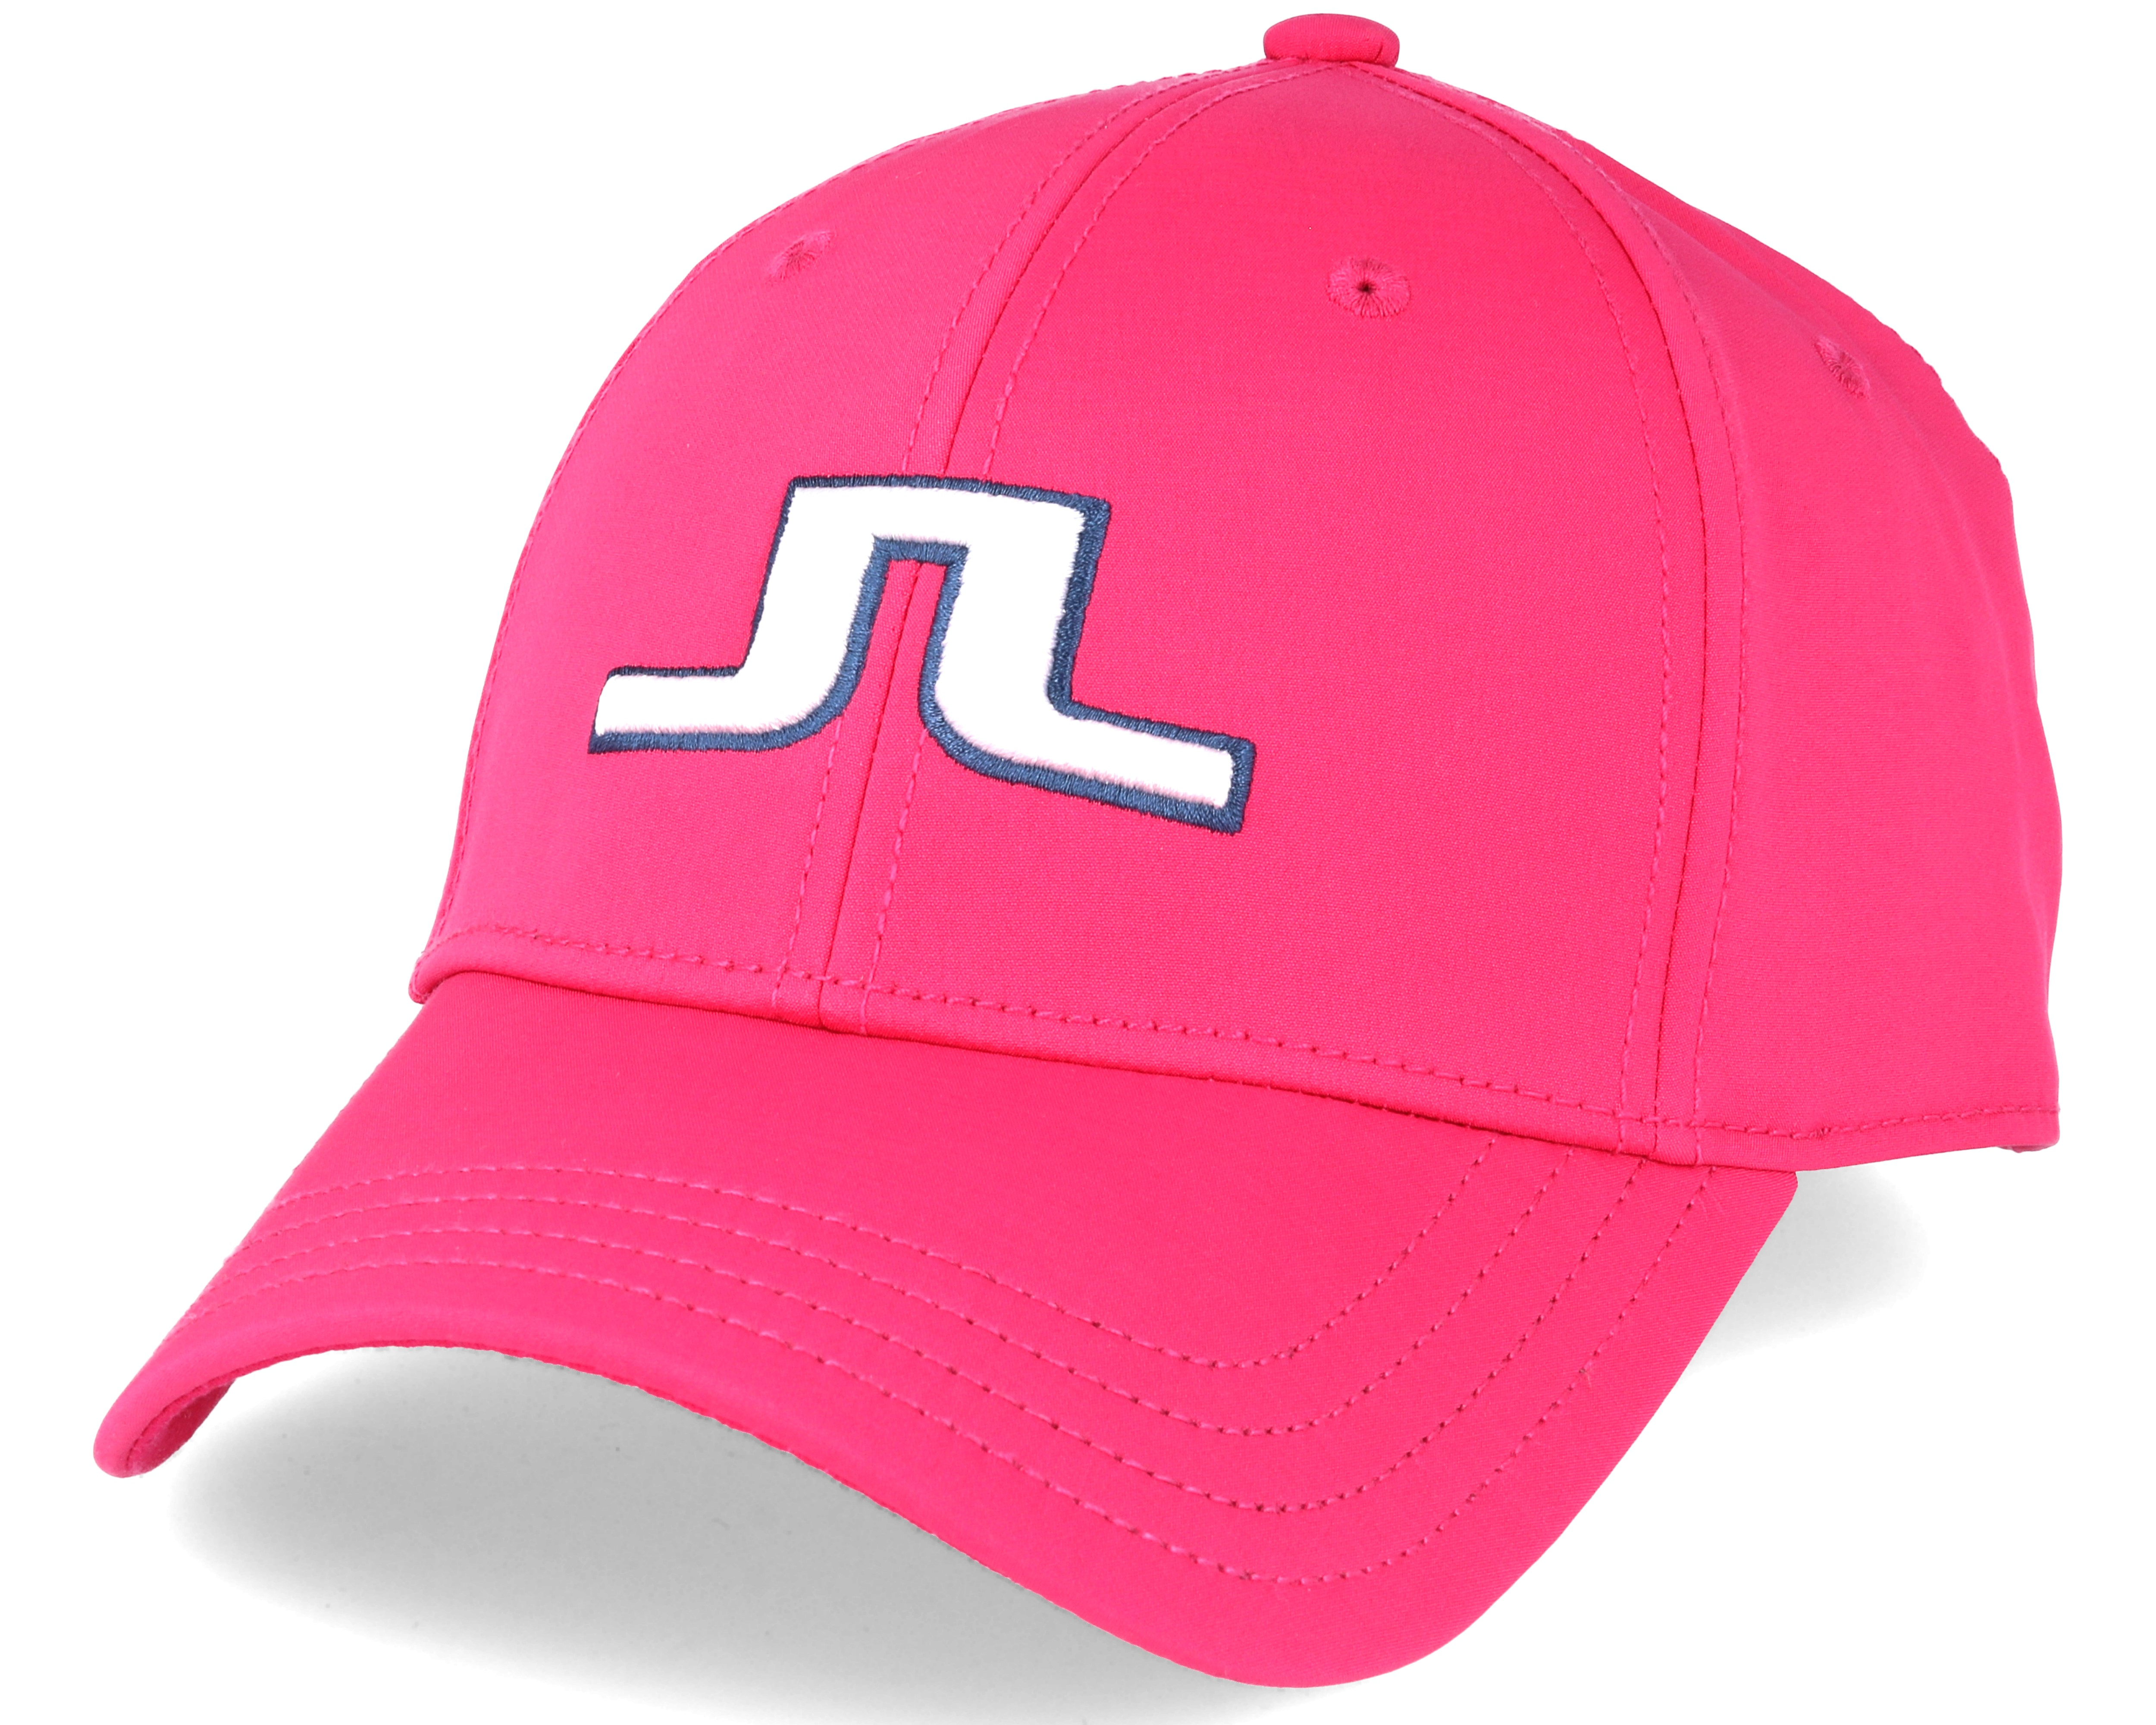 596649d89a4 Angus Tech Stretch Pink Intense Adjustable - J.Lindeberg caps ...